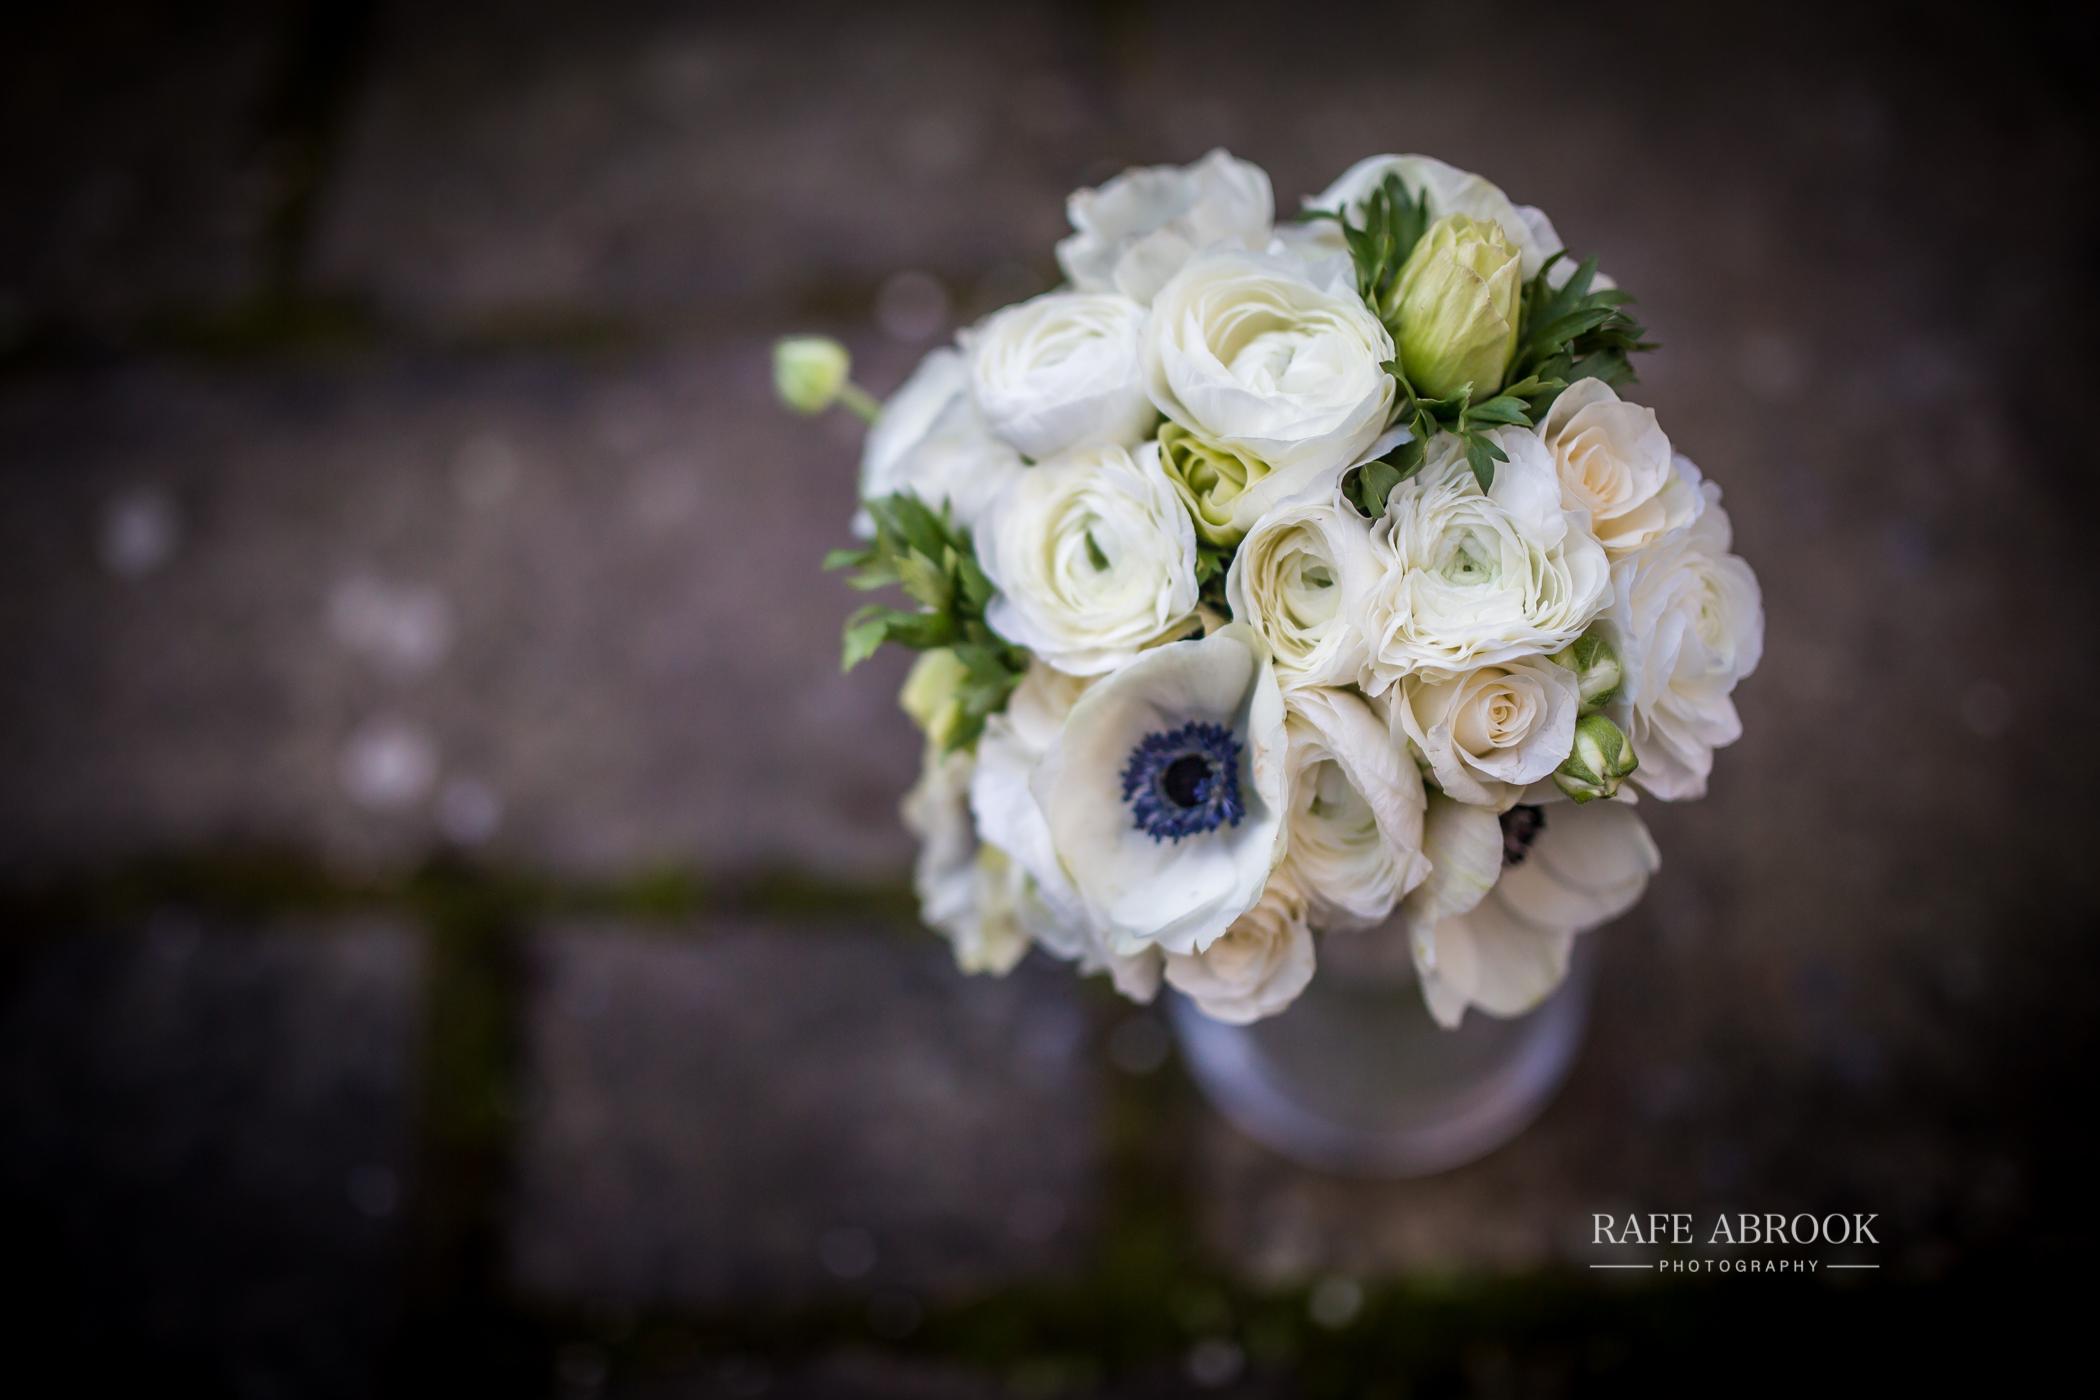 roma & pete wedding hampstead shenley hertfordshire -58.jpg